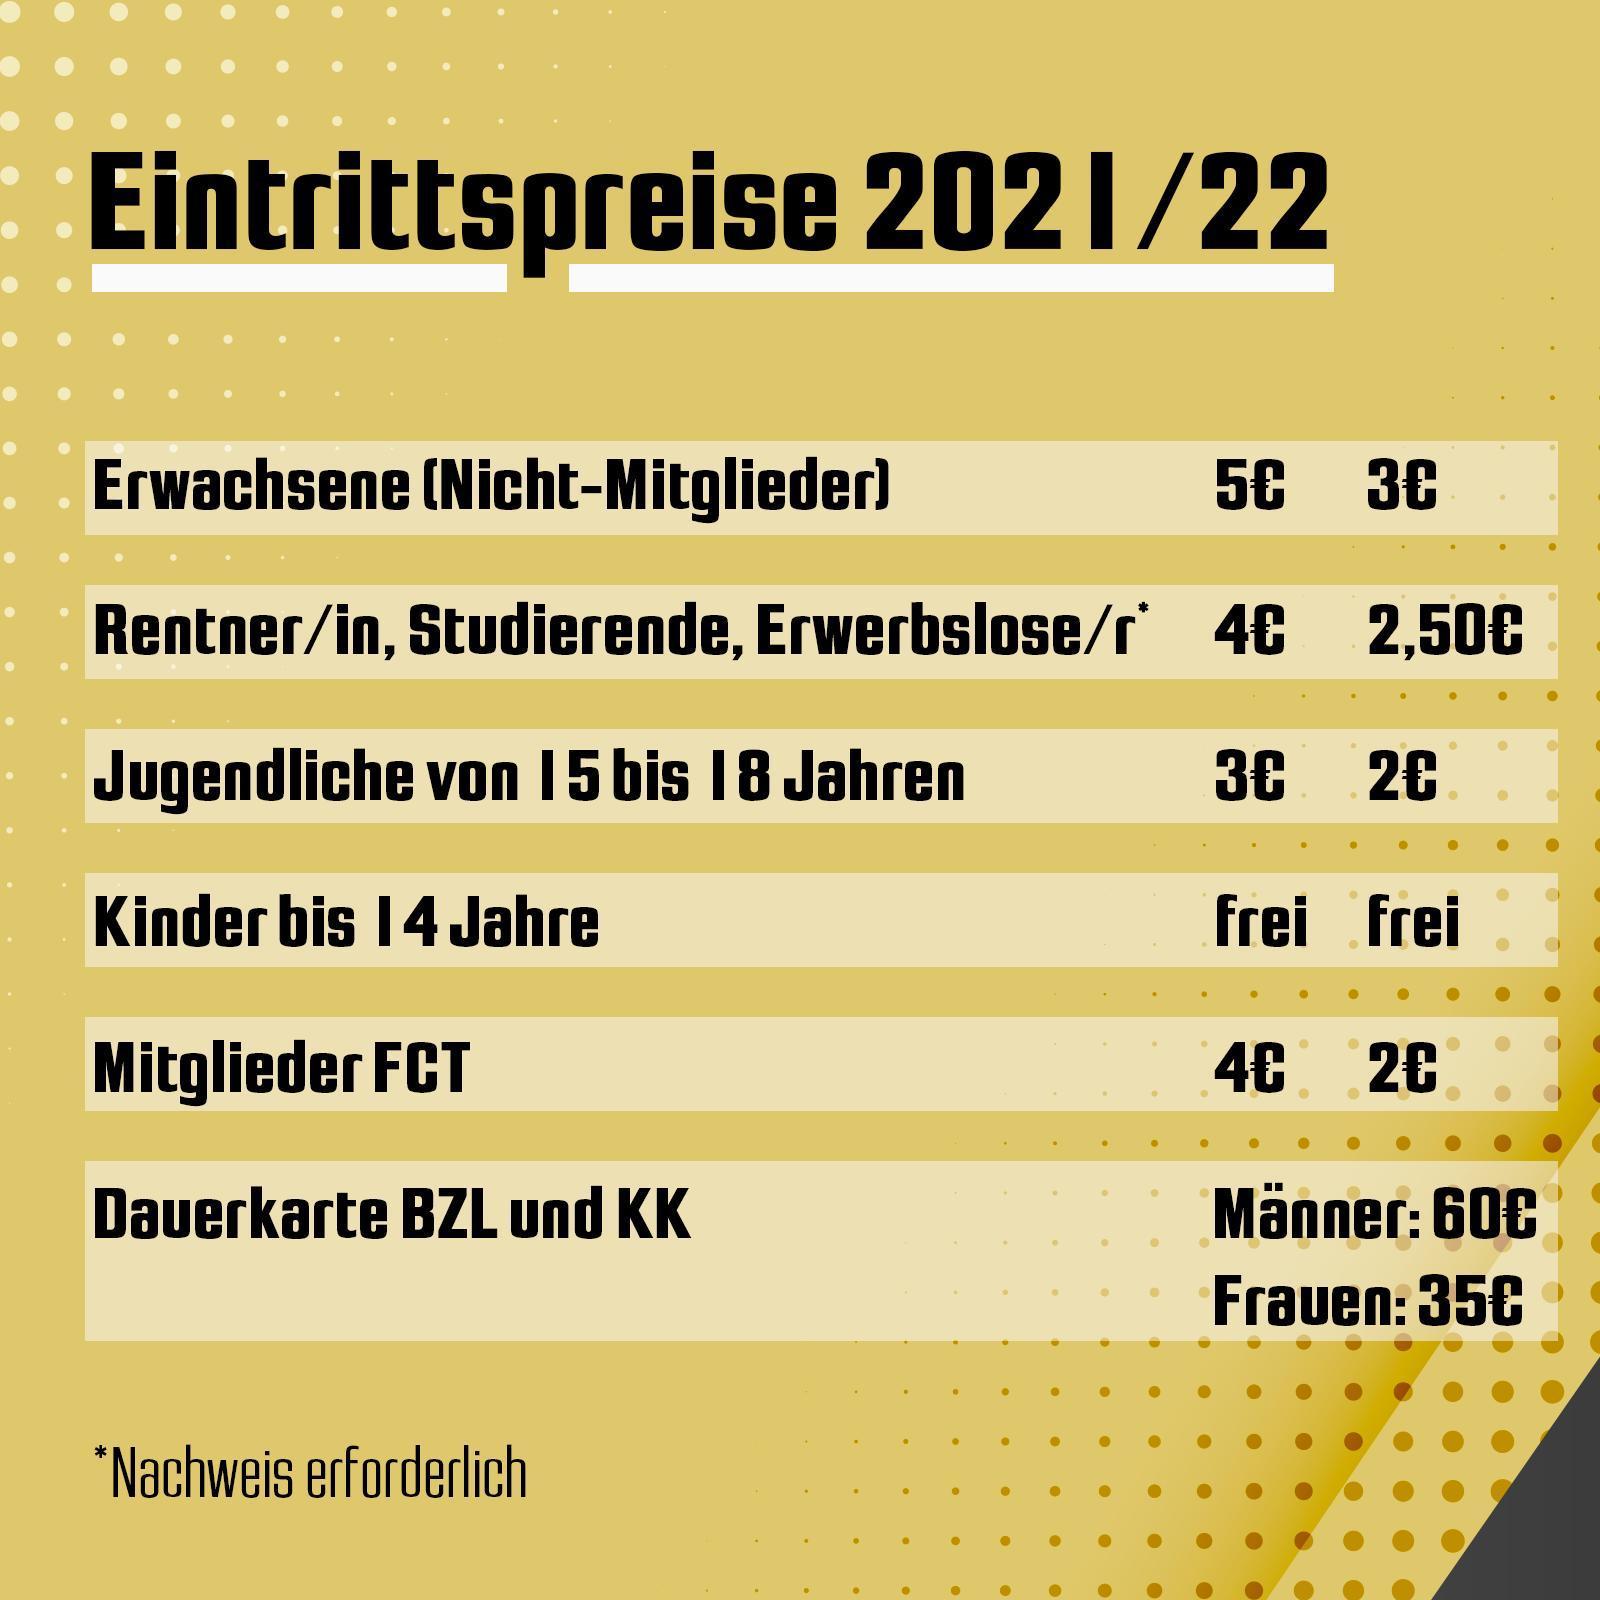 Eintrittspreise Saison 2021/2022